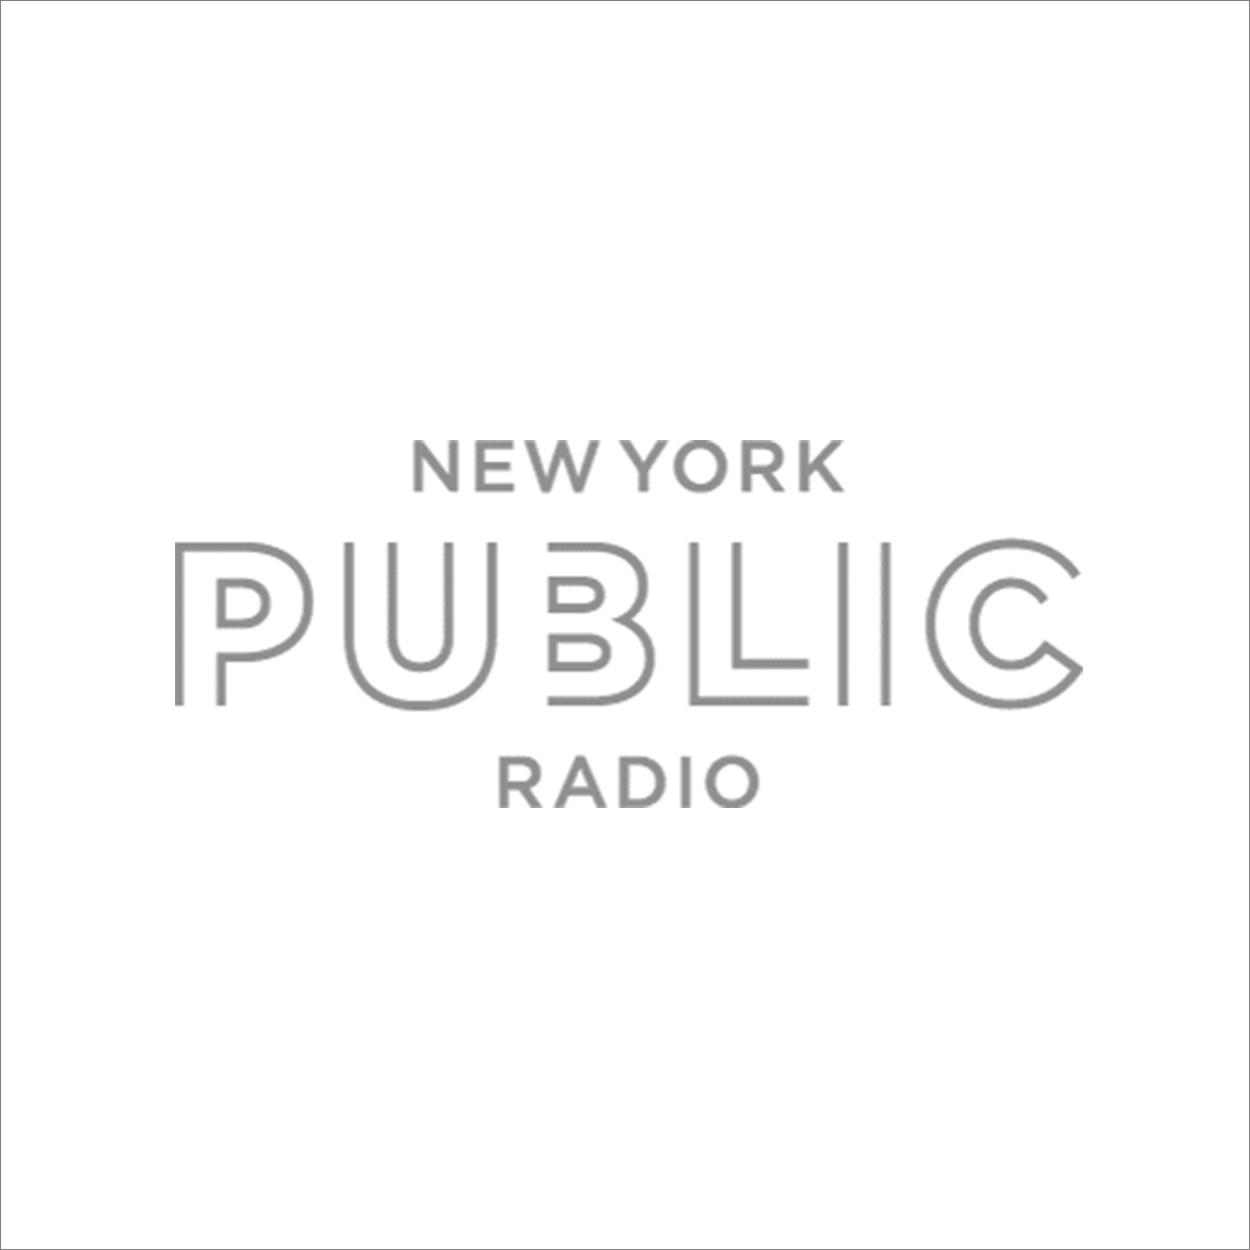 nypr_logo.jpg